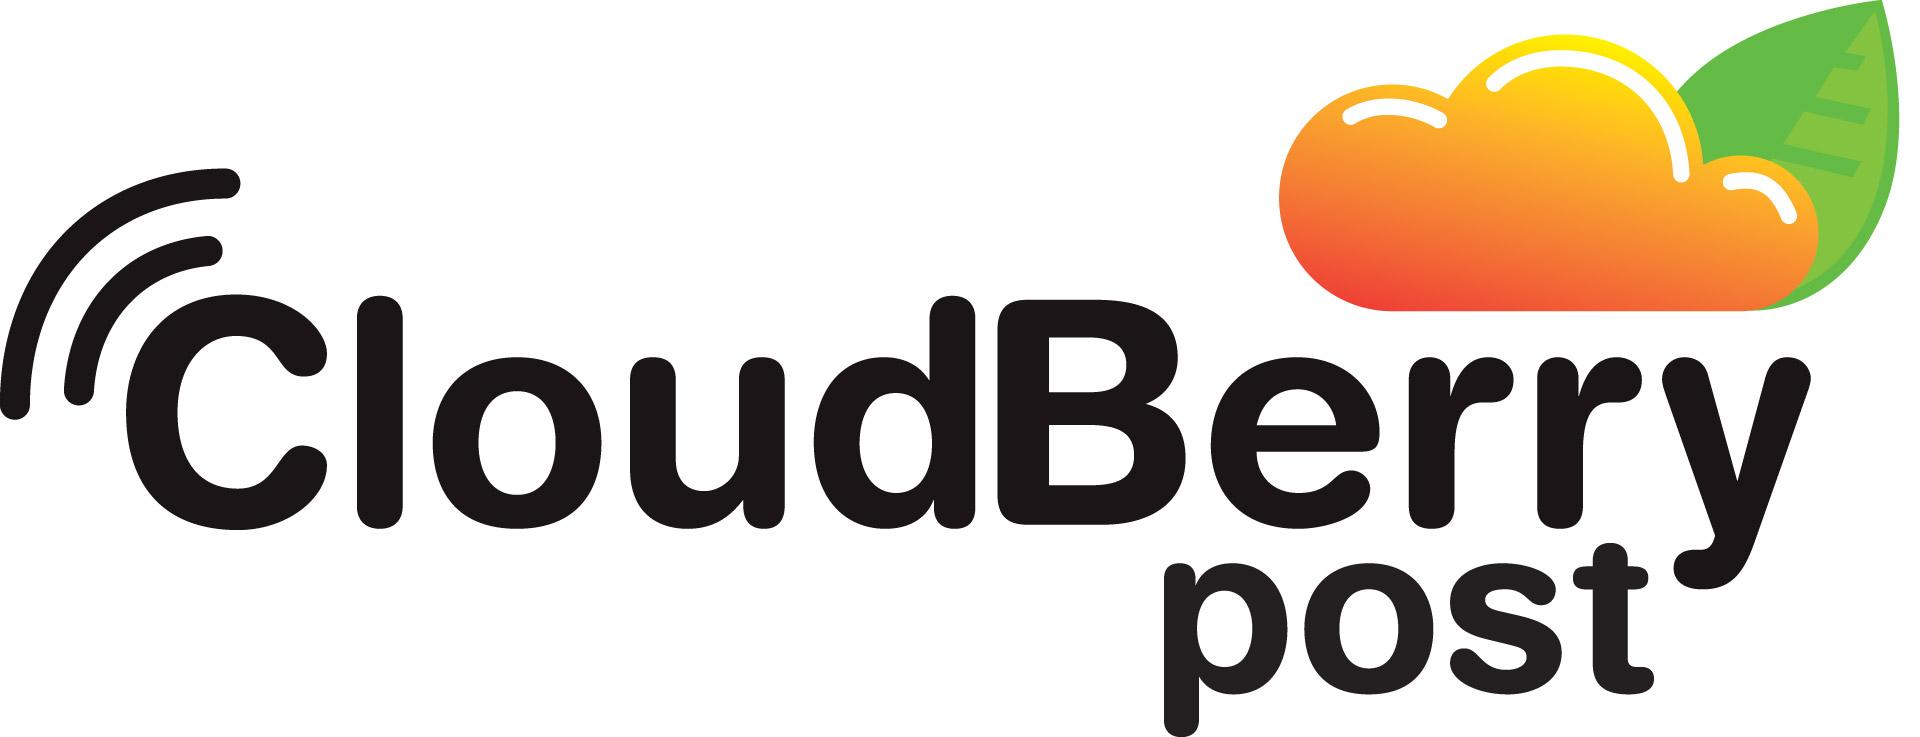 cloudberry_big_web